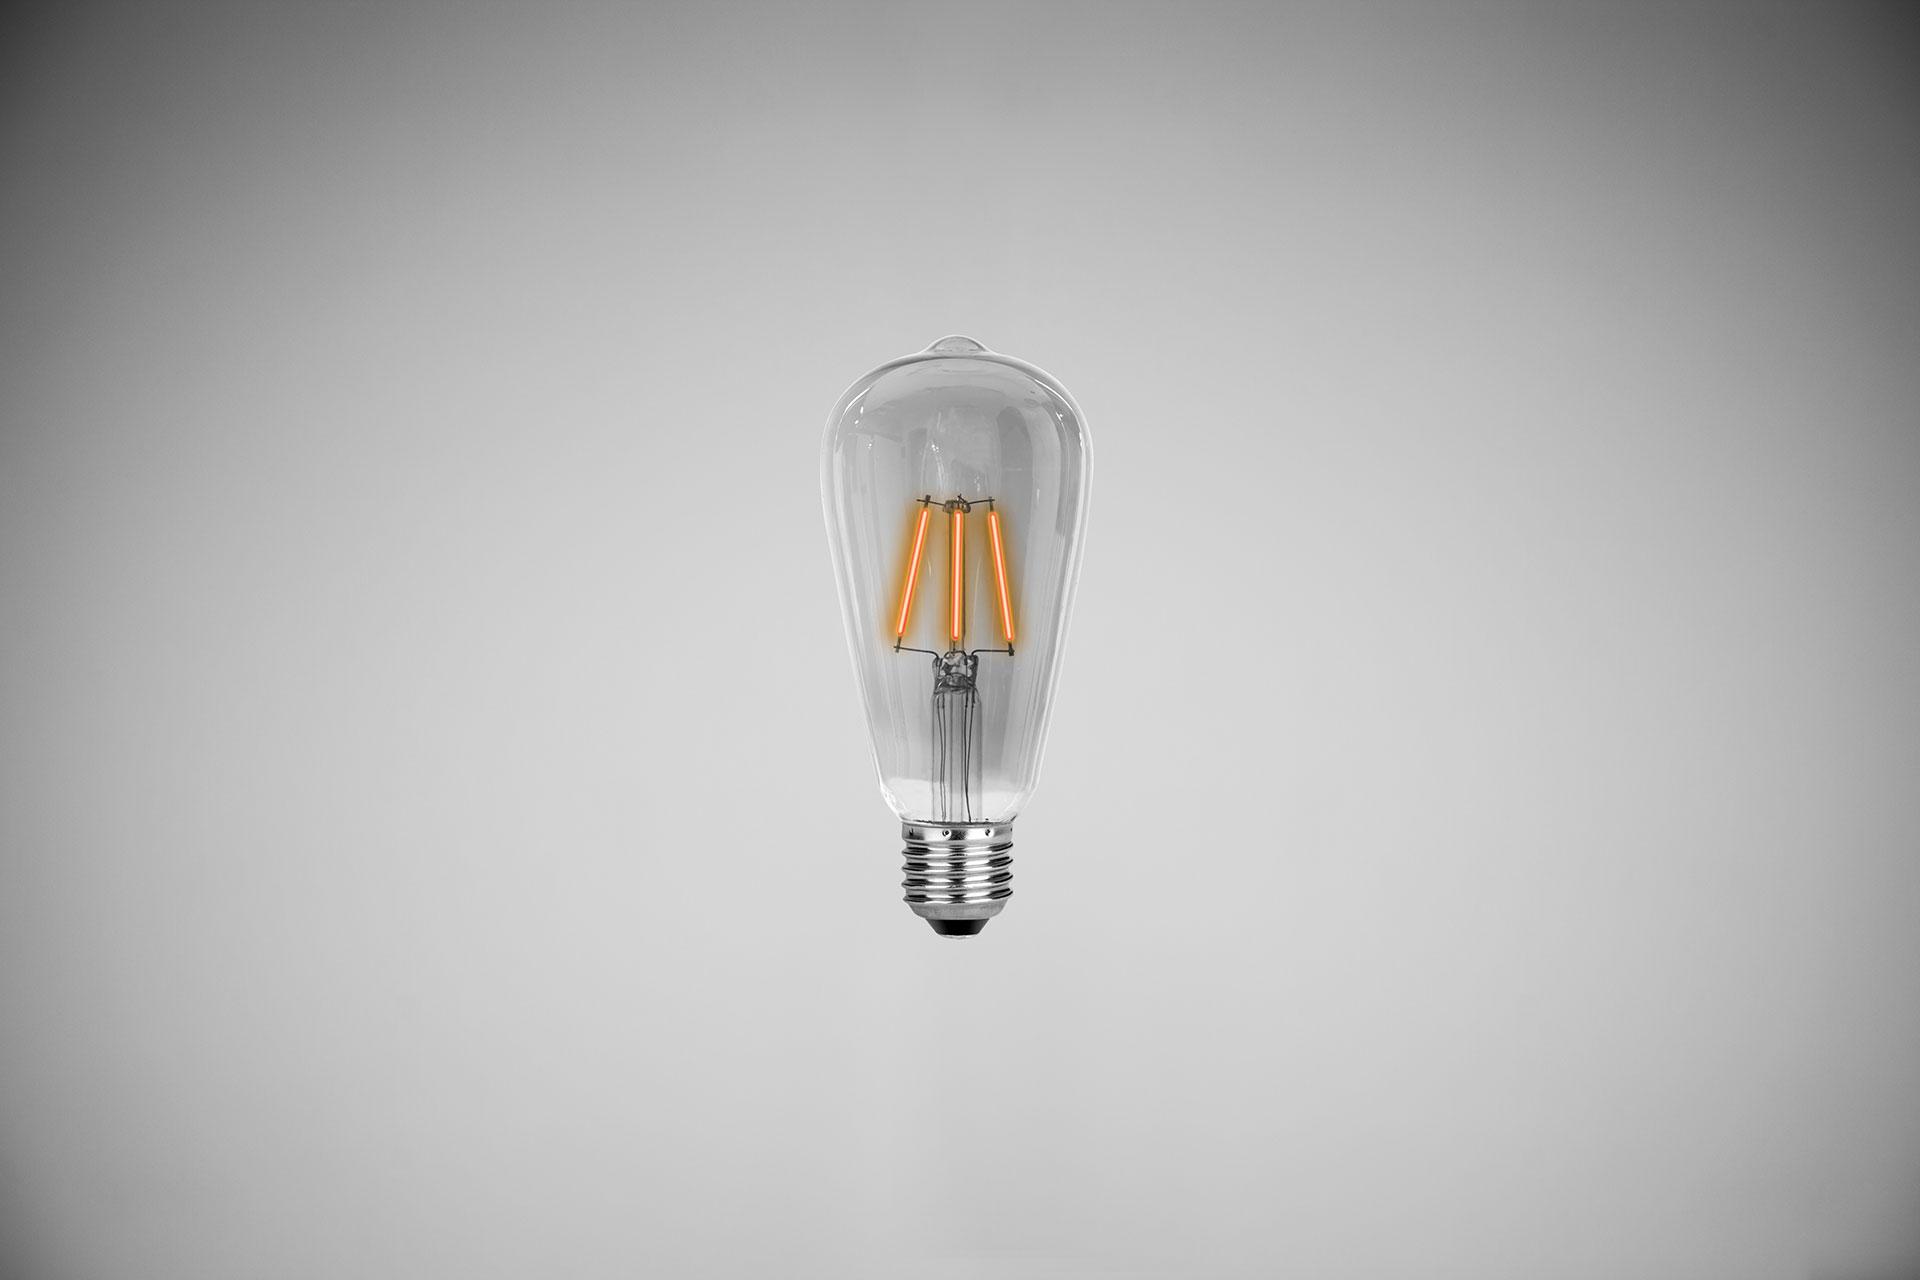 PEACH-LED